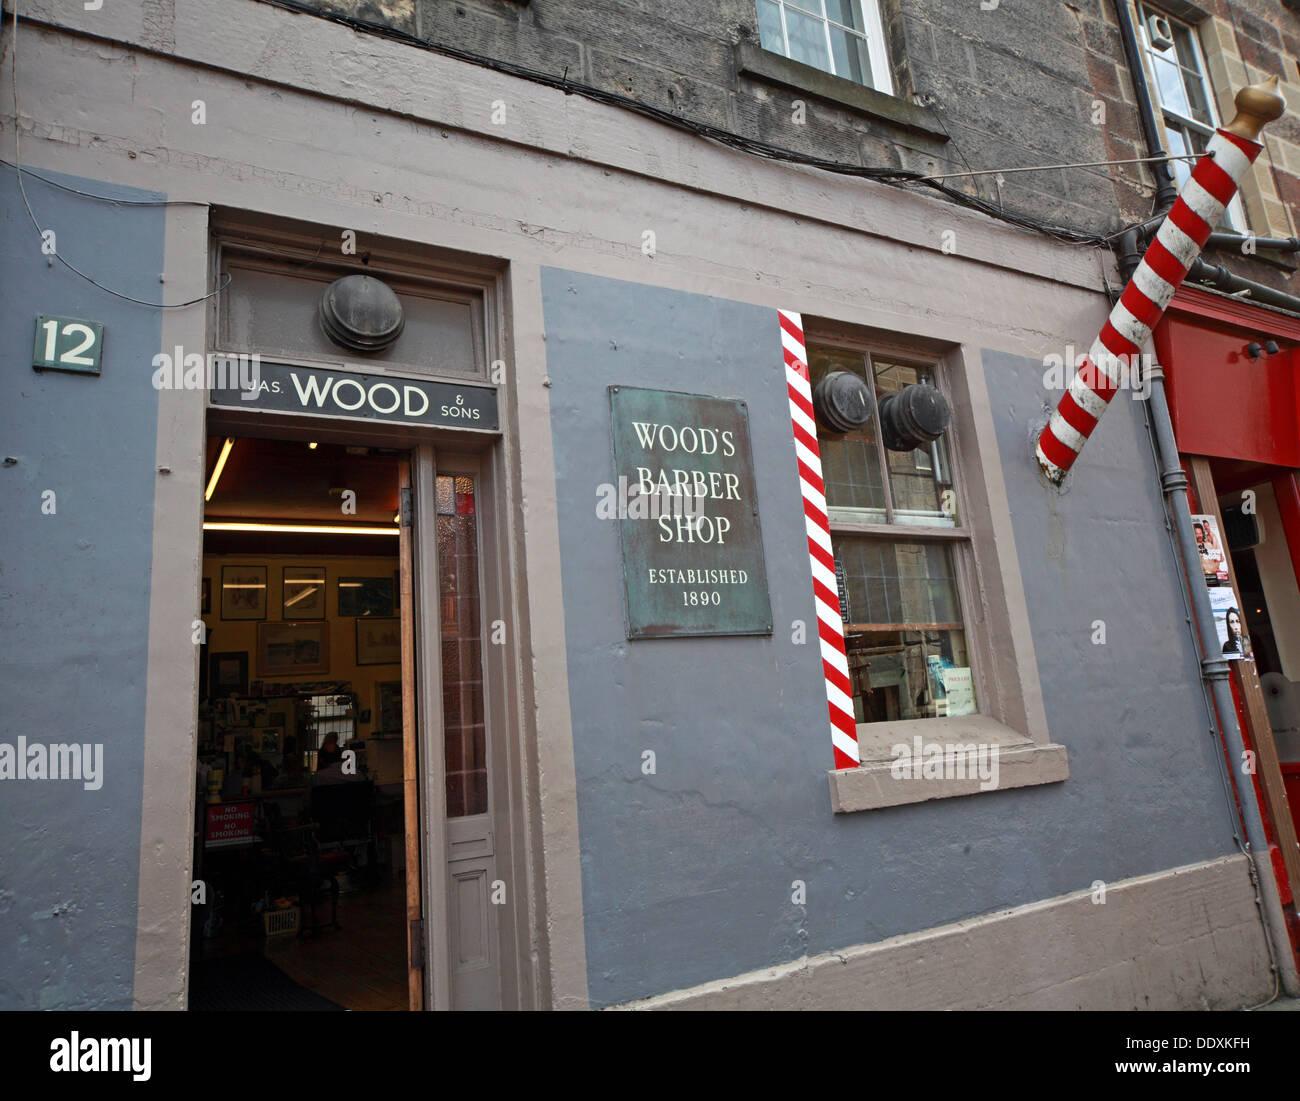 Laden Sie dieses Alamy Stockfoto Traditionelle Holz Friseure, Friseur, 12 Drummond Street, Edinburgh EH8 9TU - DDXKFH